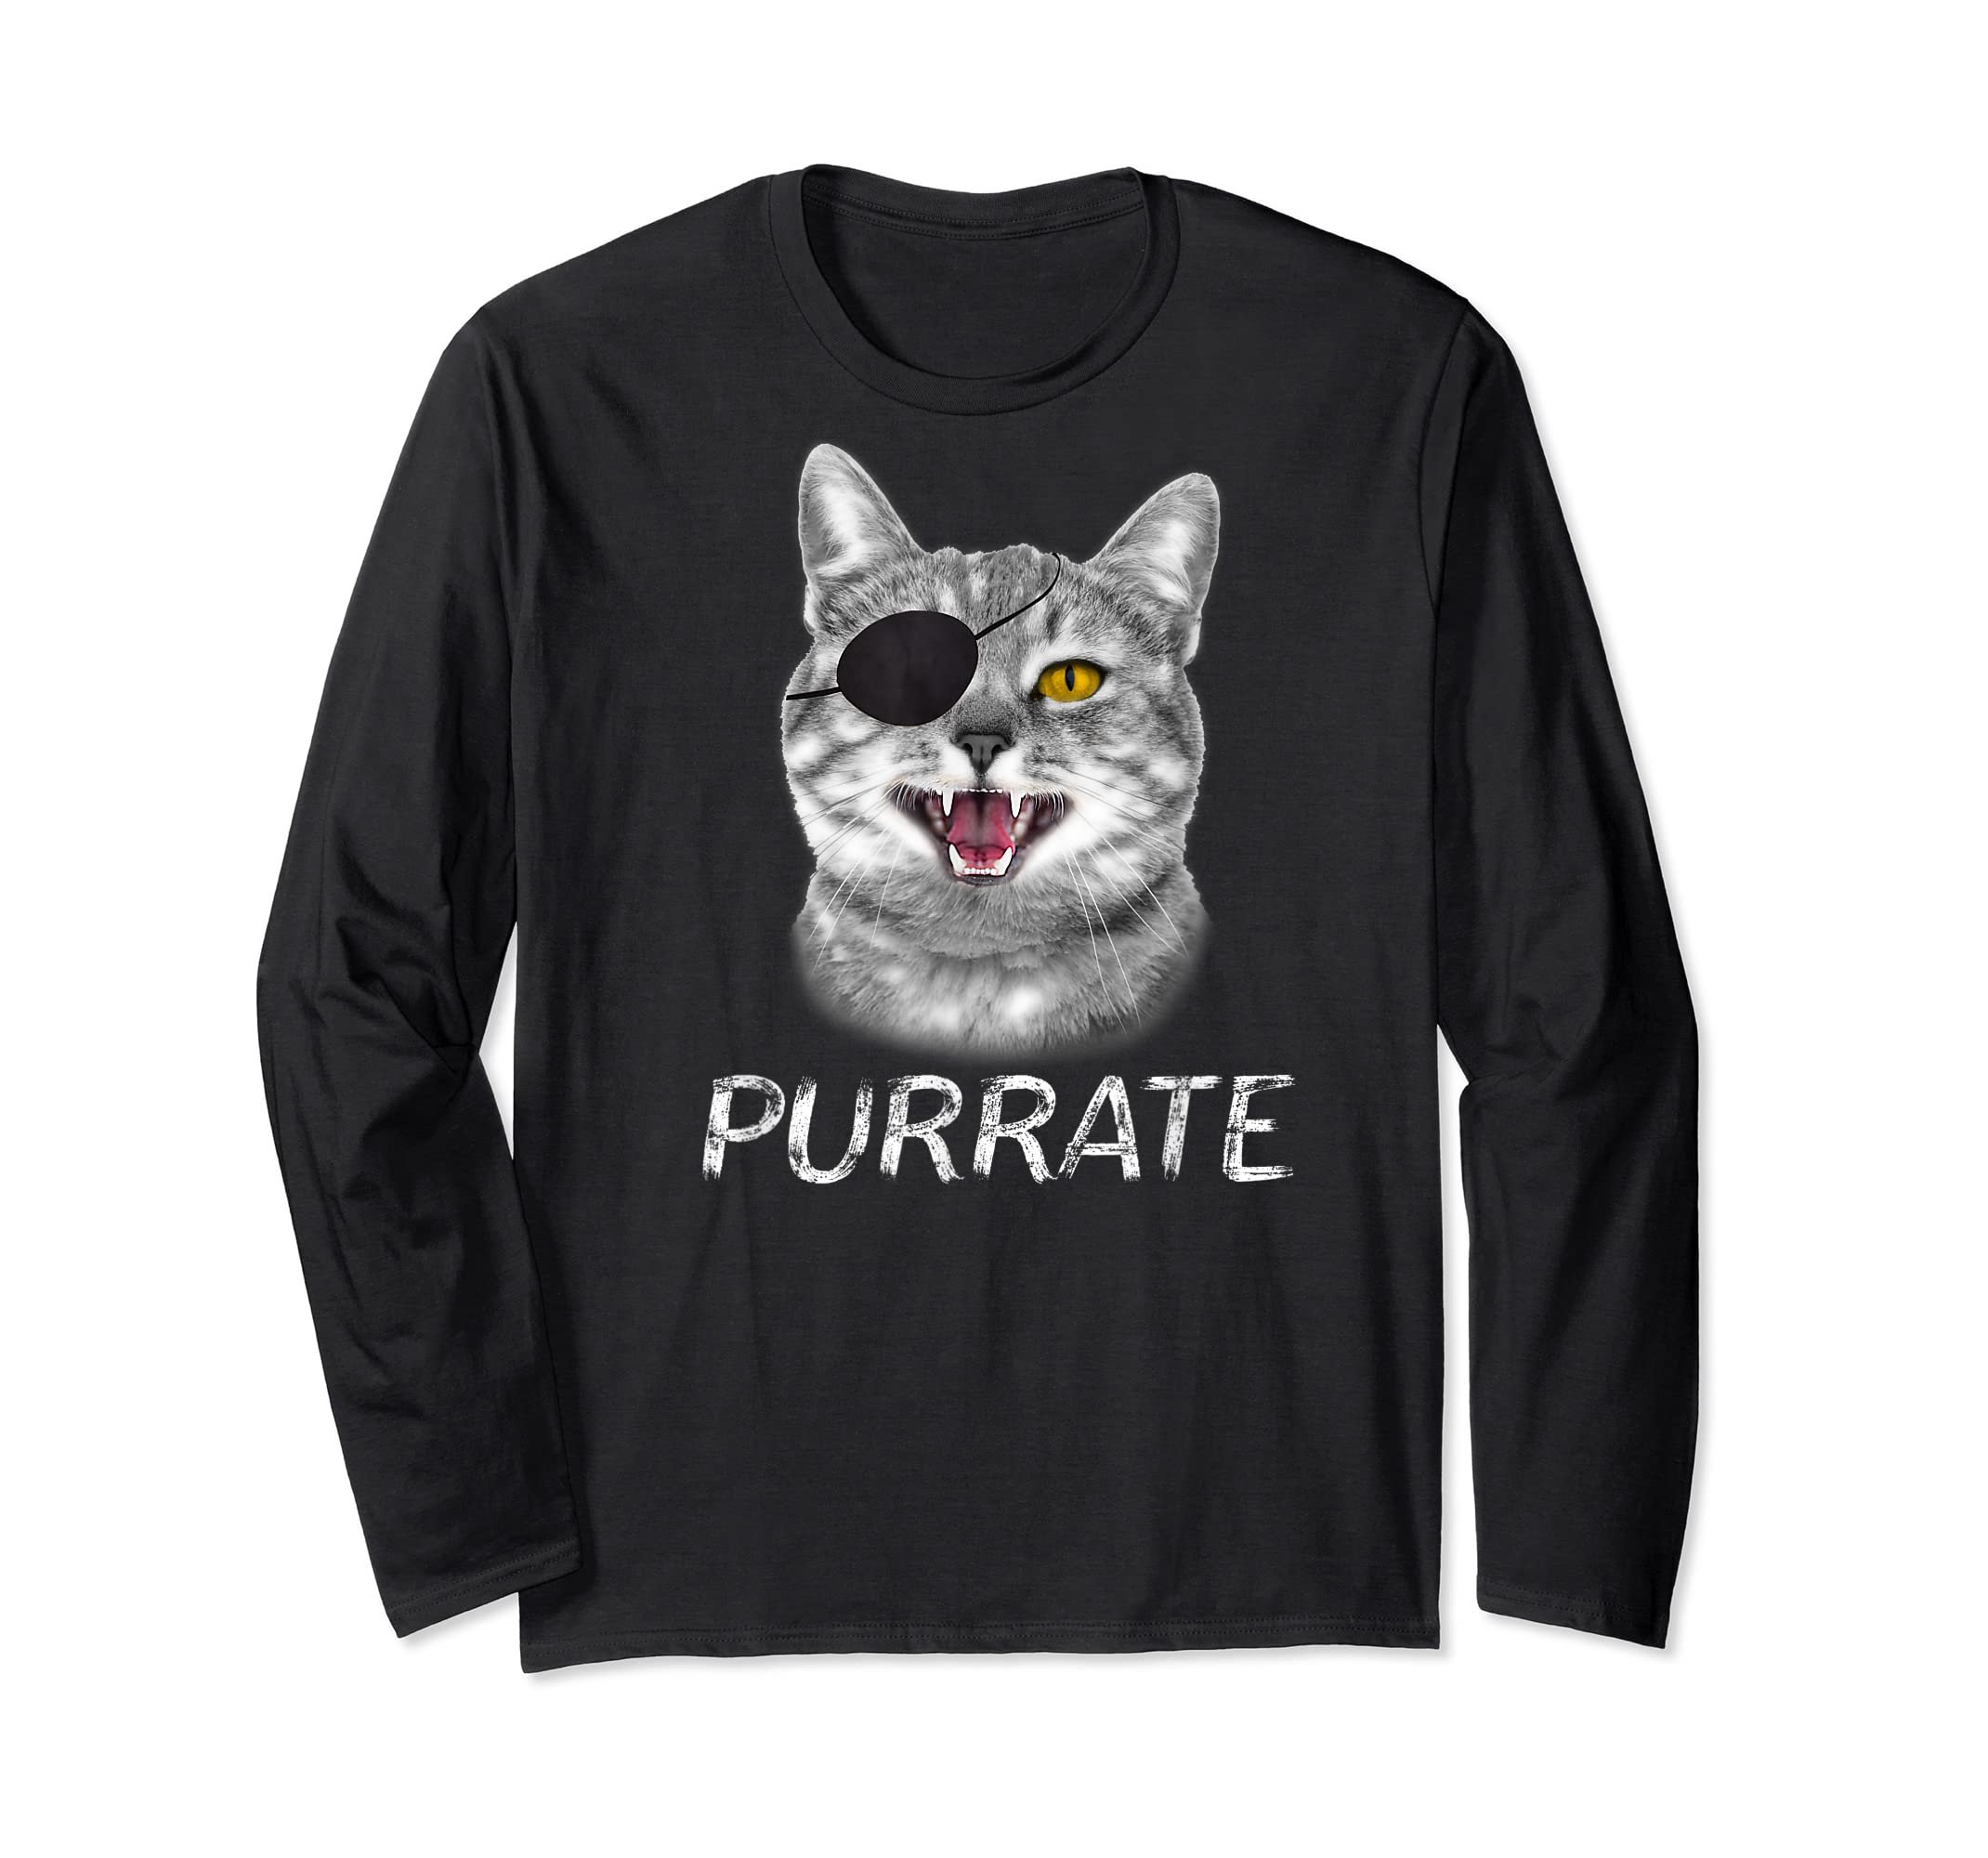 Halloween Trick Treat Cat Pirate Purrate T-Shirt-Long Sleeve-Black